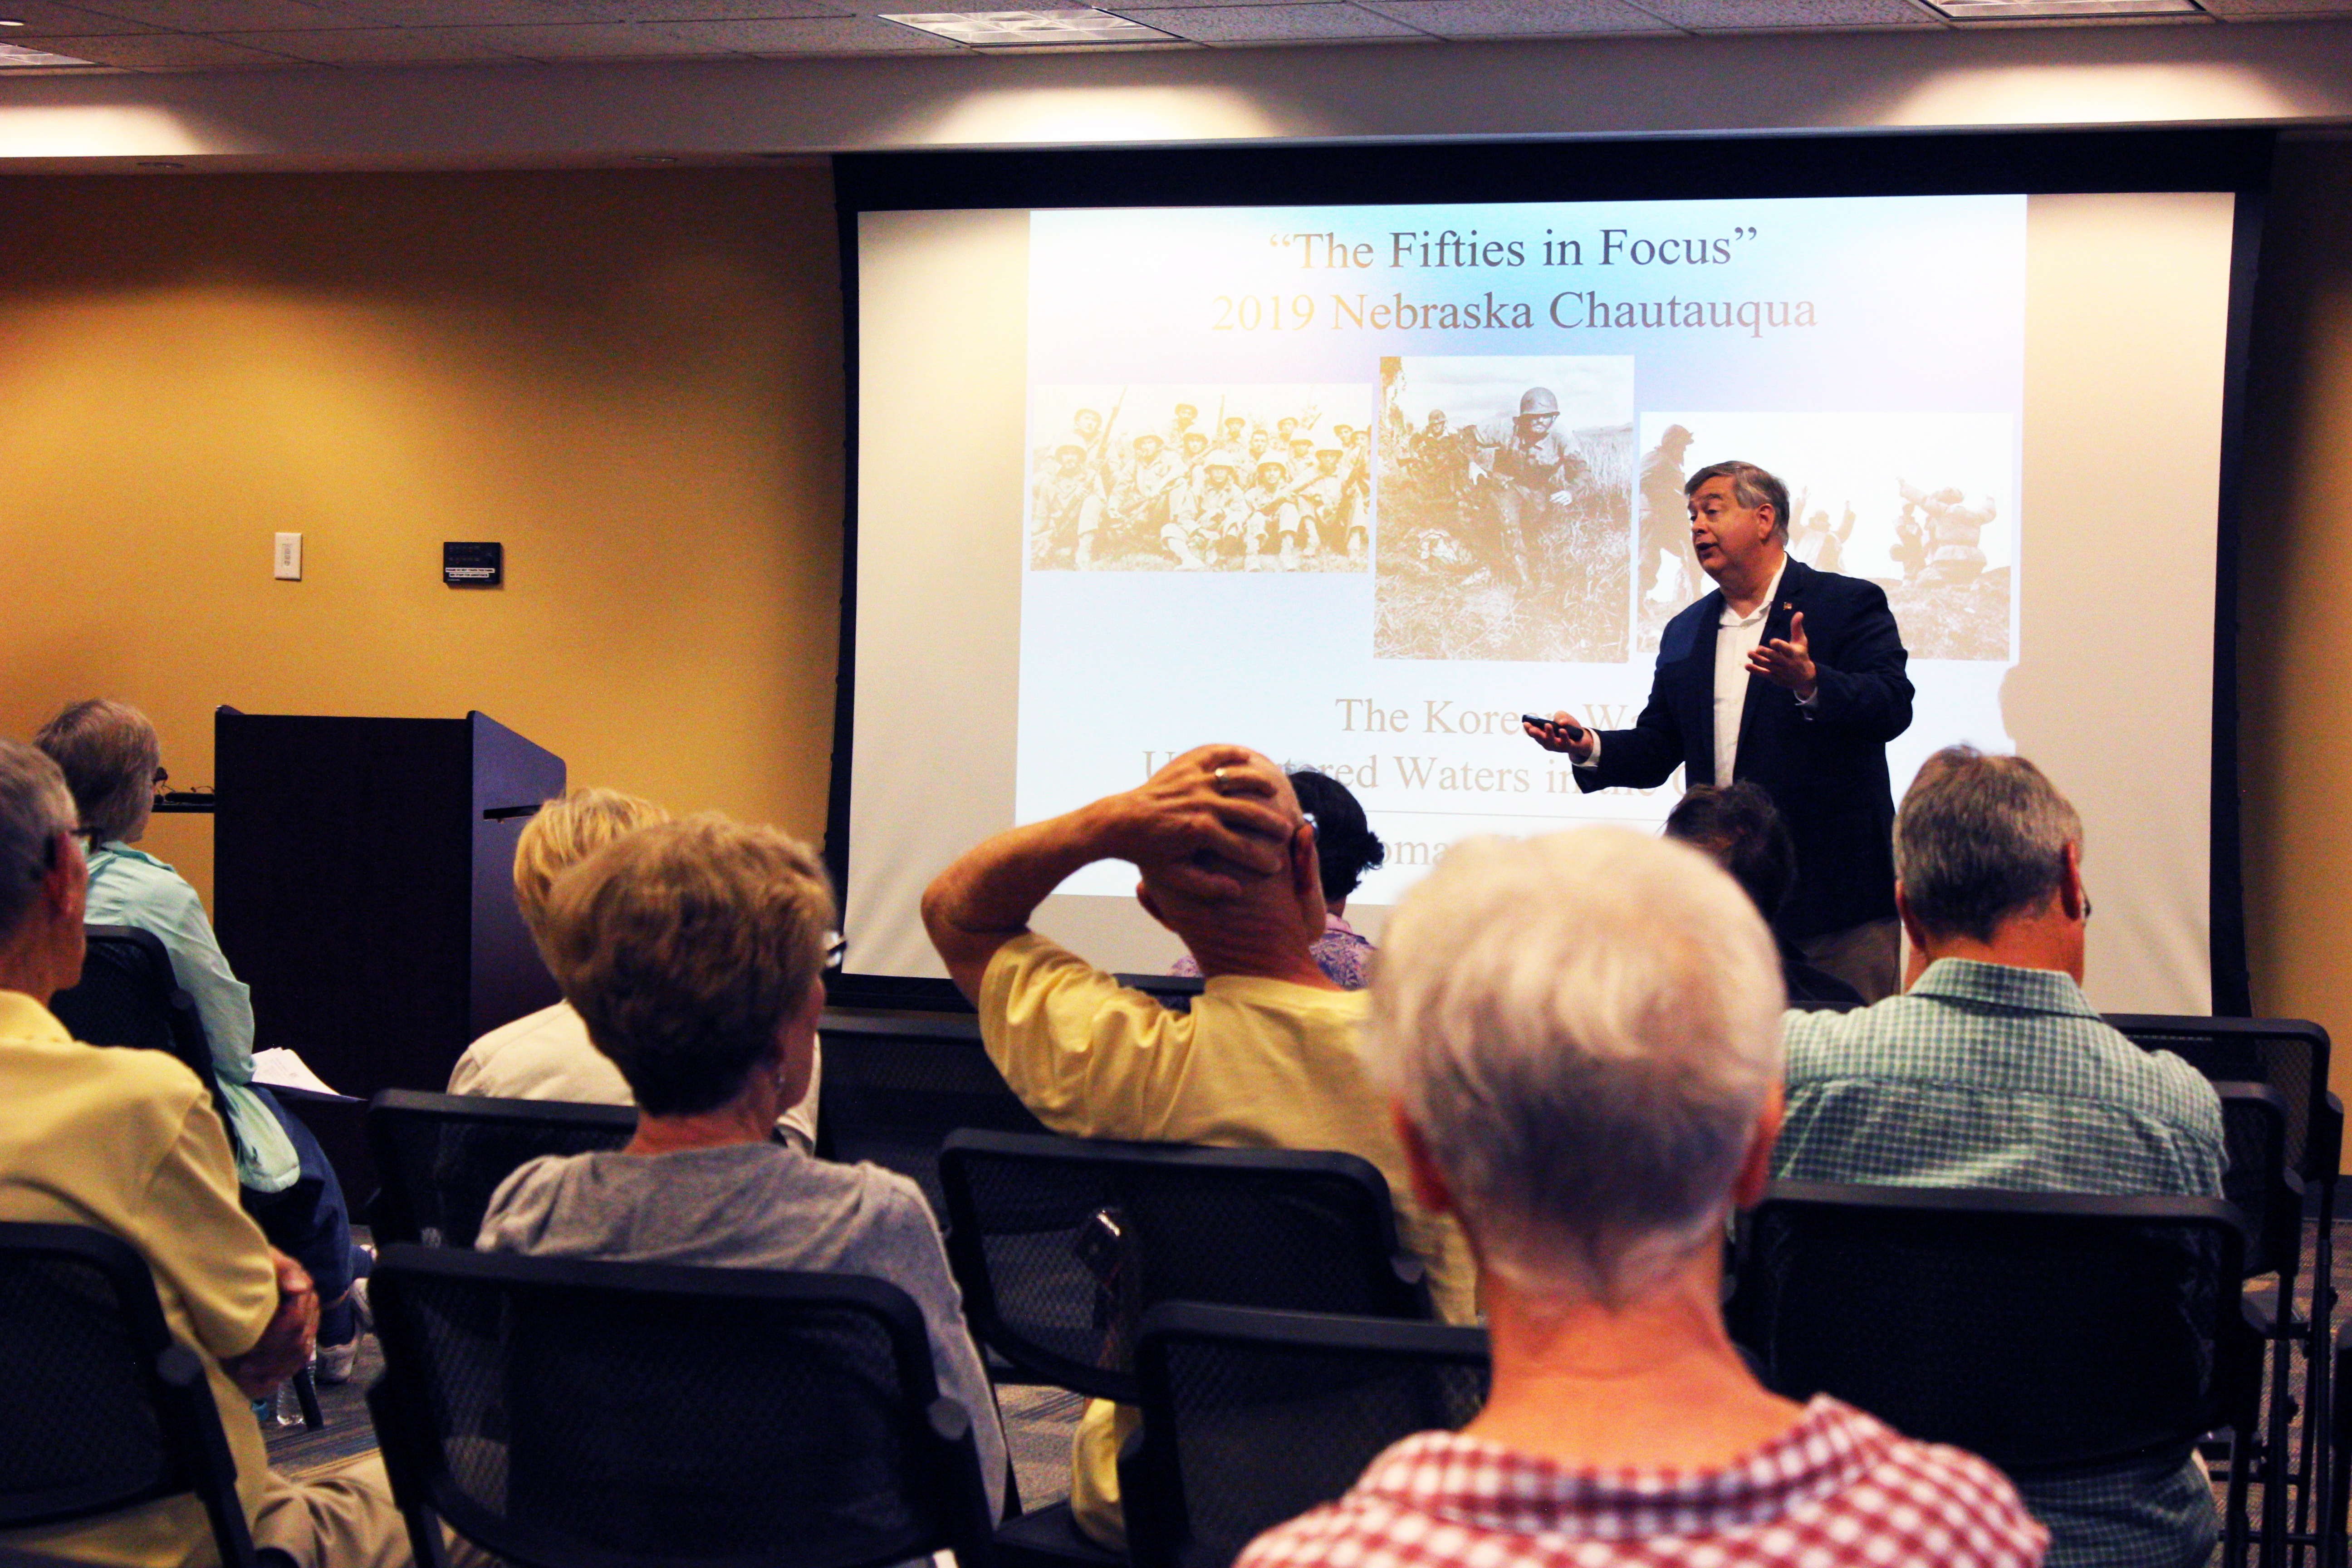 Dr. Thomas Berg session: The Korean War